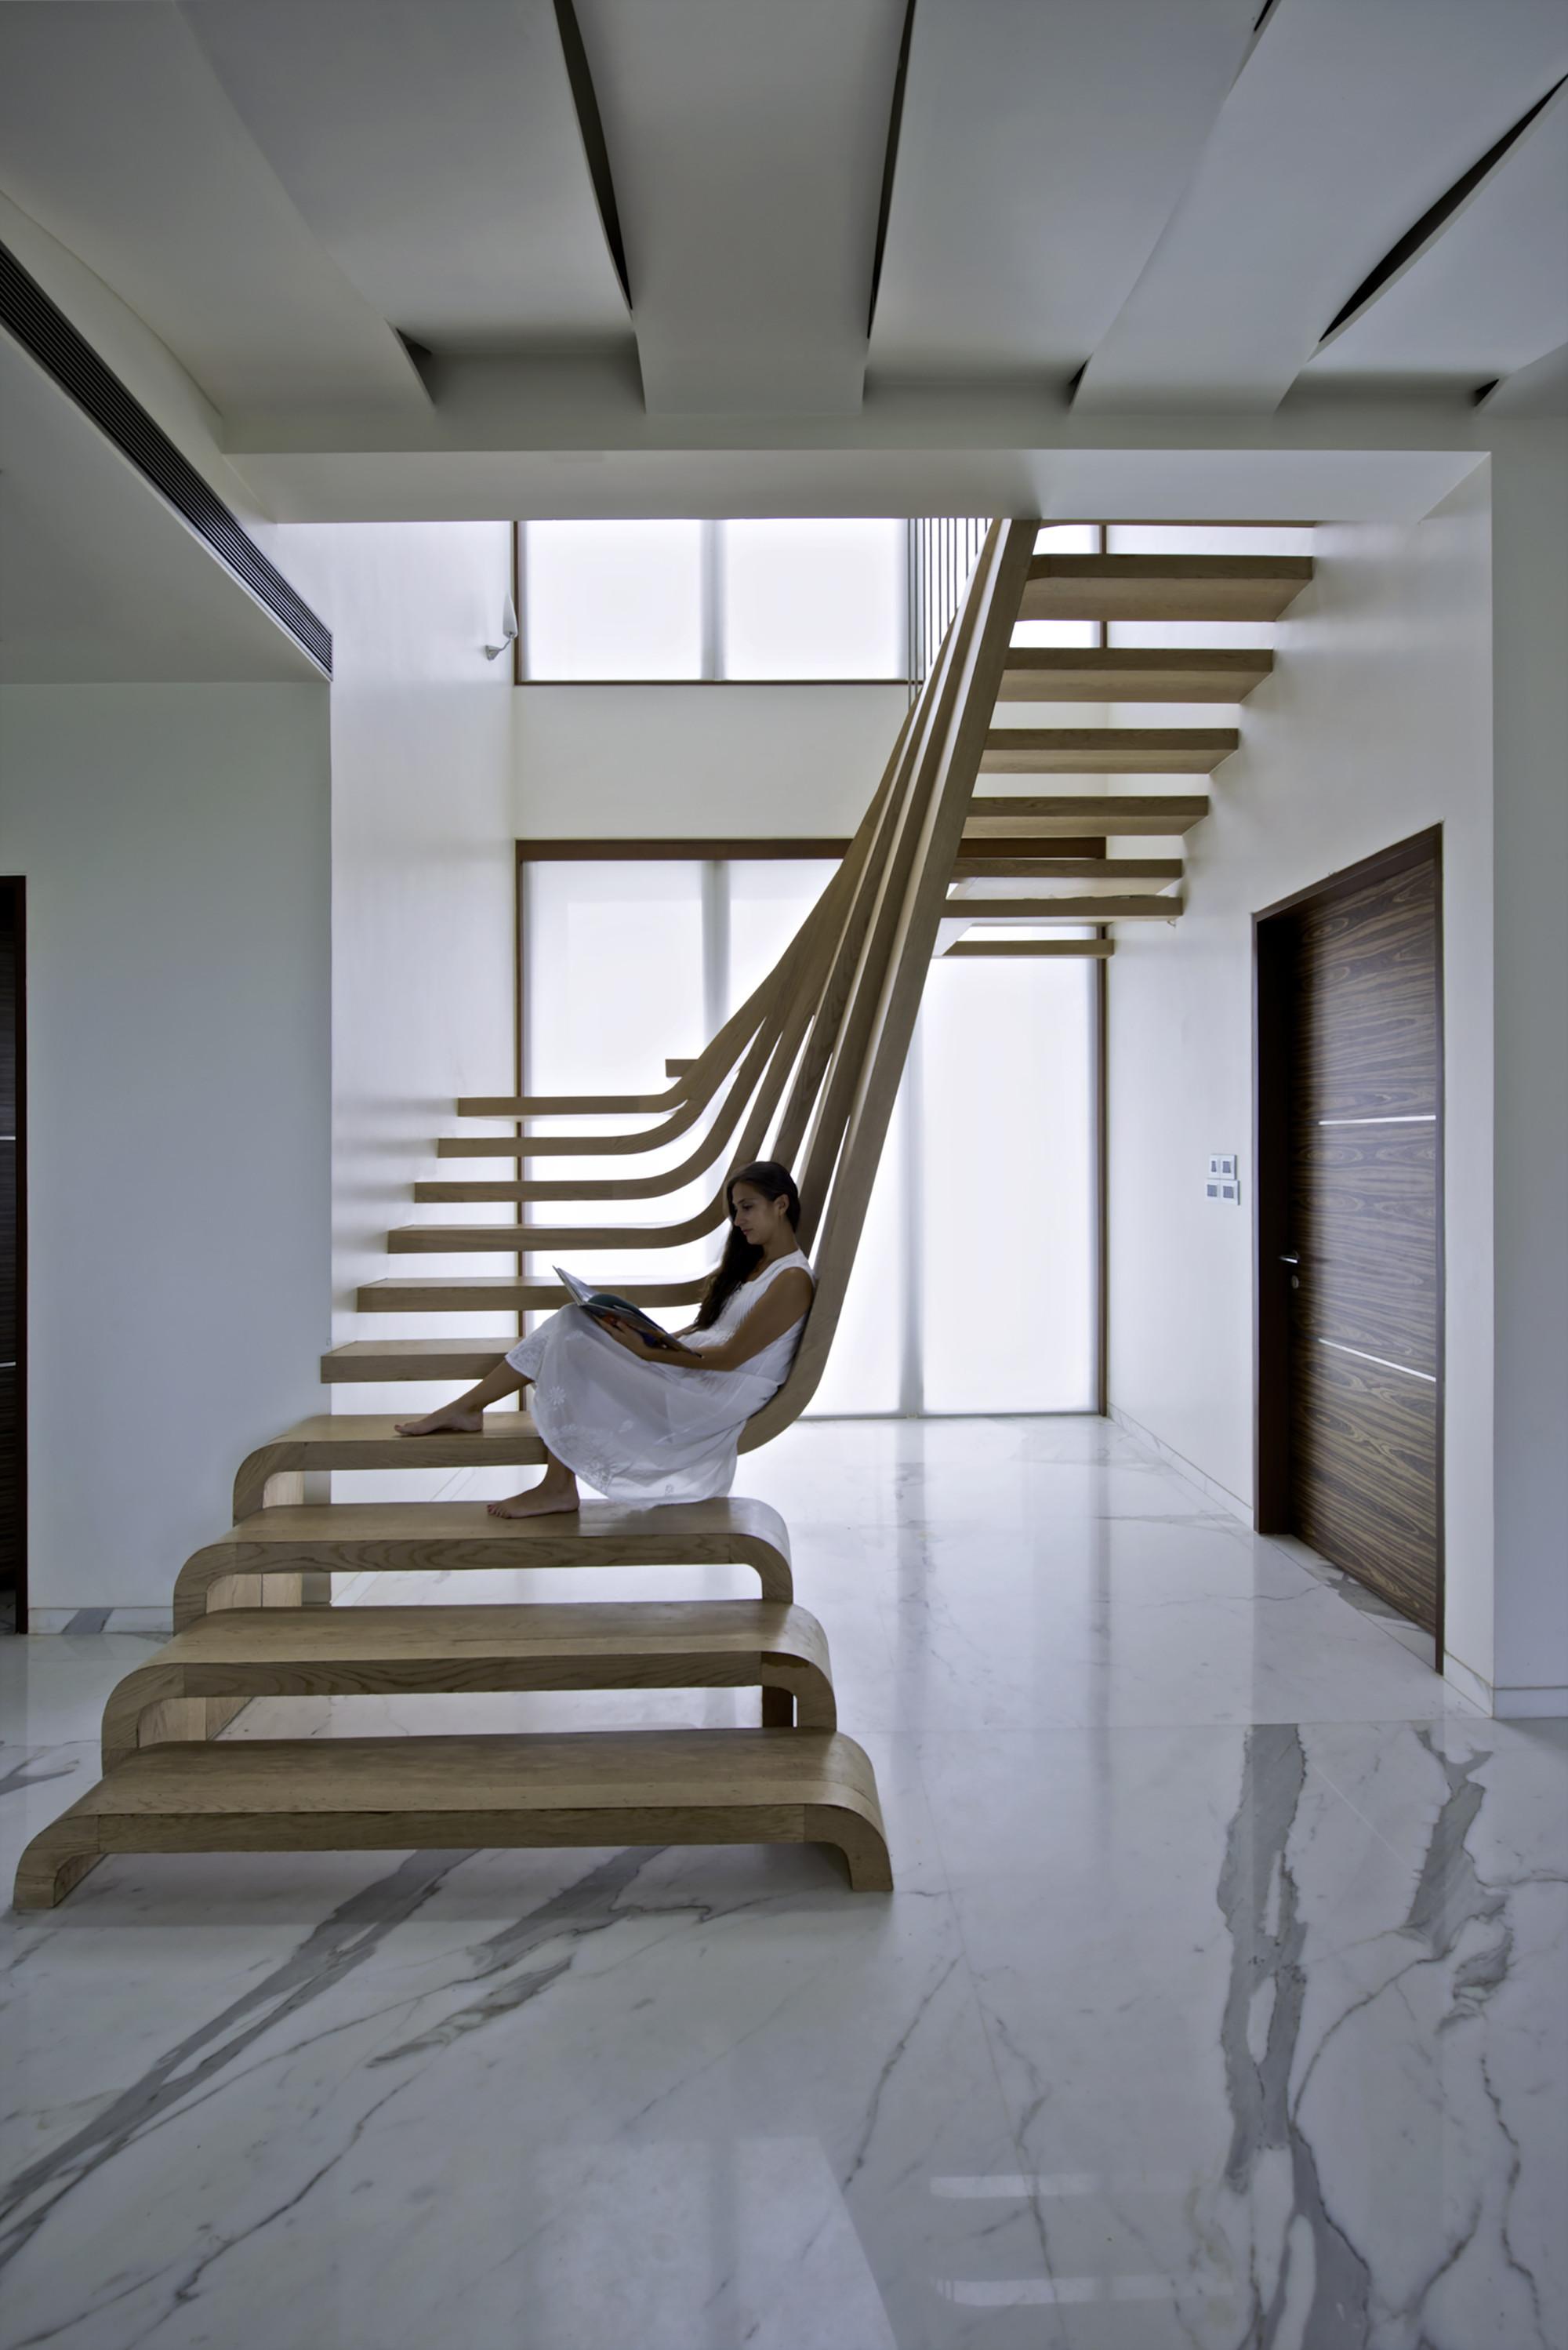 Gallery of sdm apartment arquitectura en movimiento workshop 1 - Architectuur escalier ...